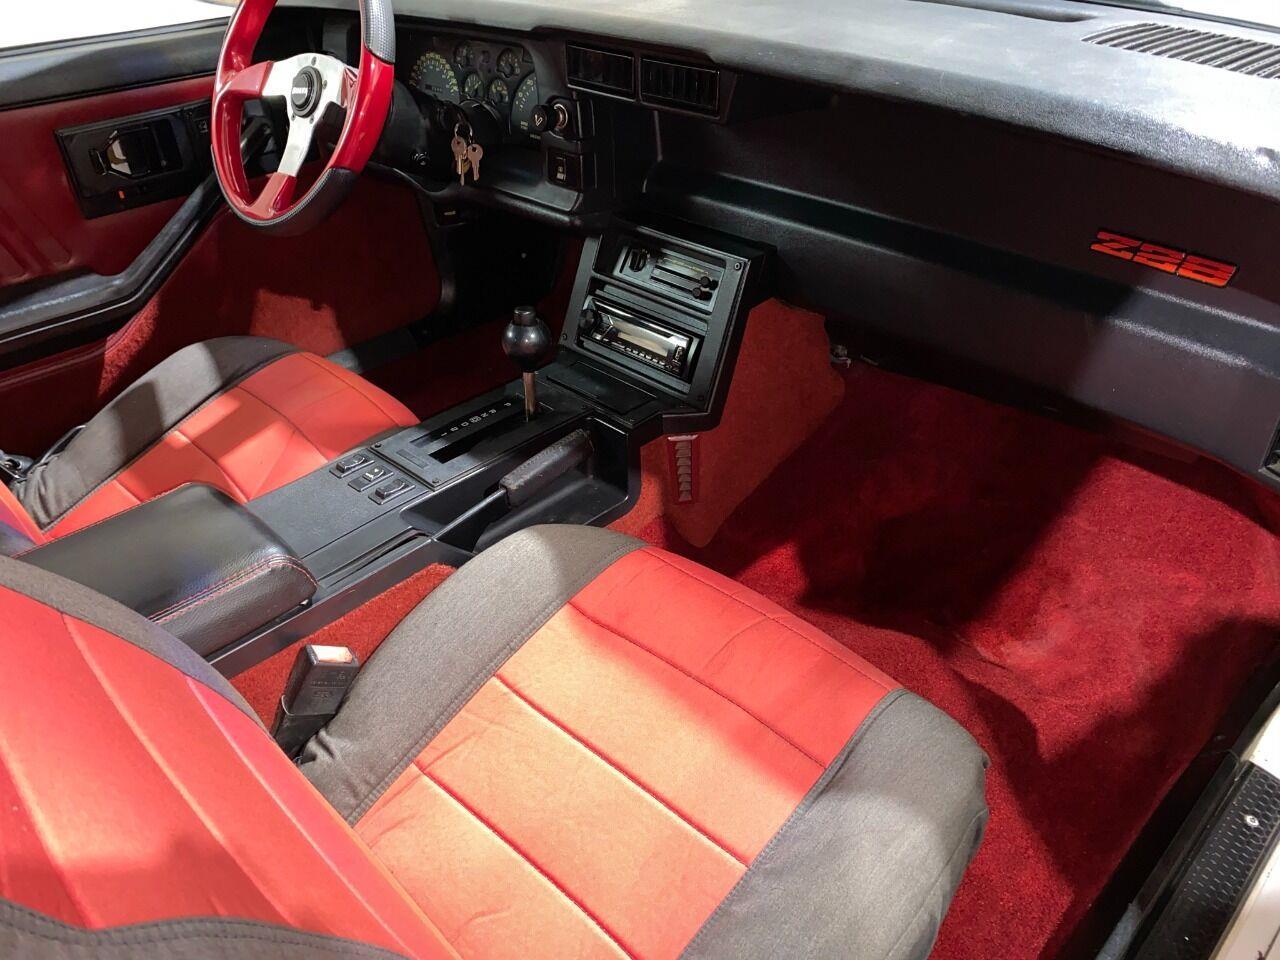 1991 Chevrolet Camaro (CC-1422274) for sale in Malone, New York